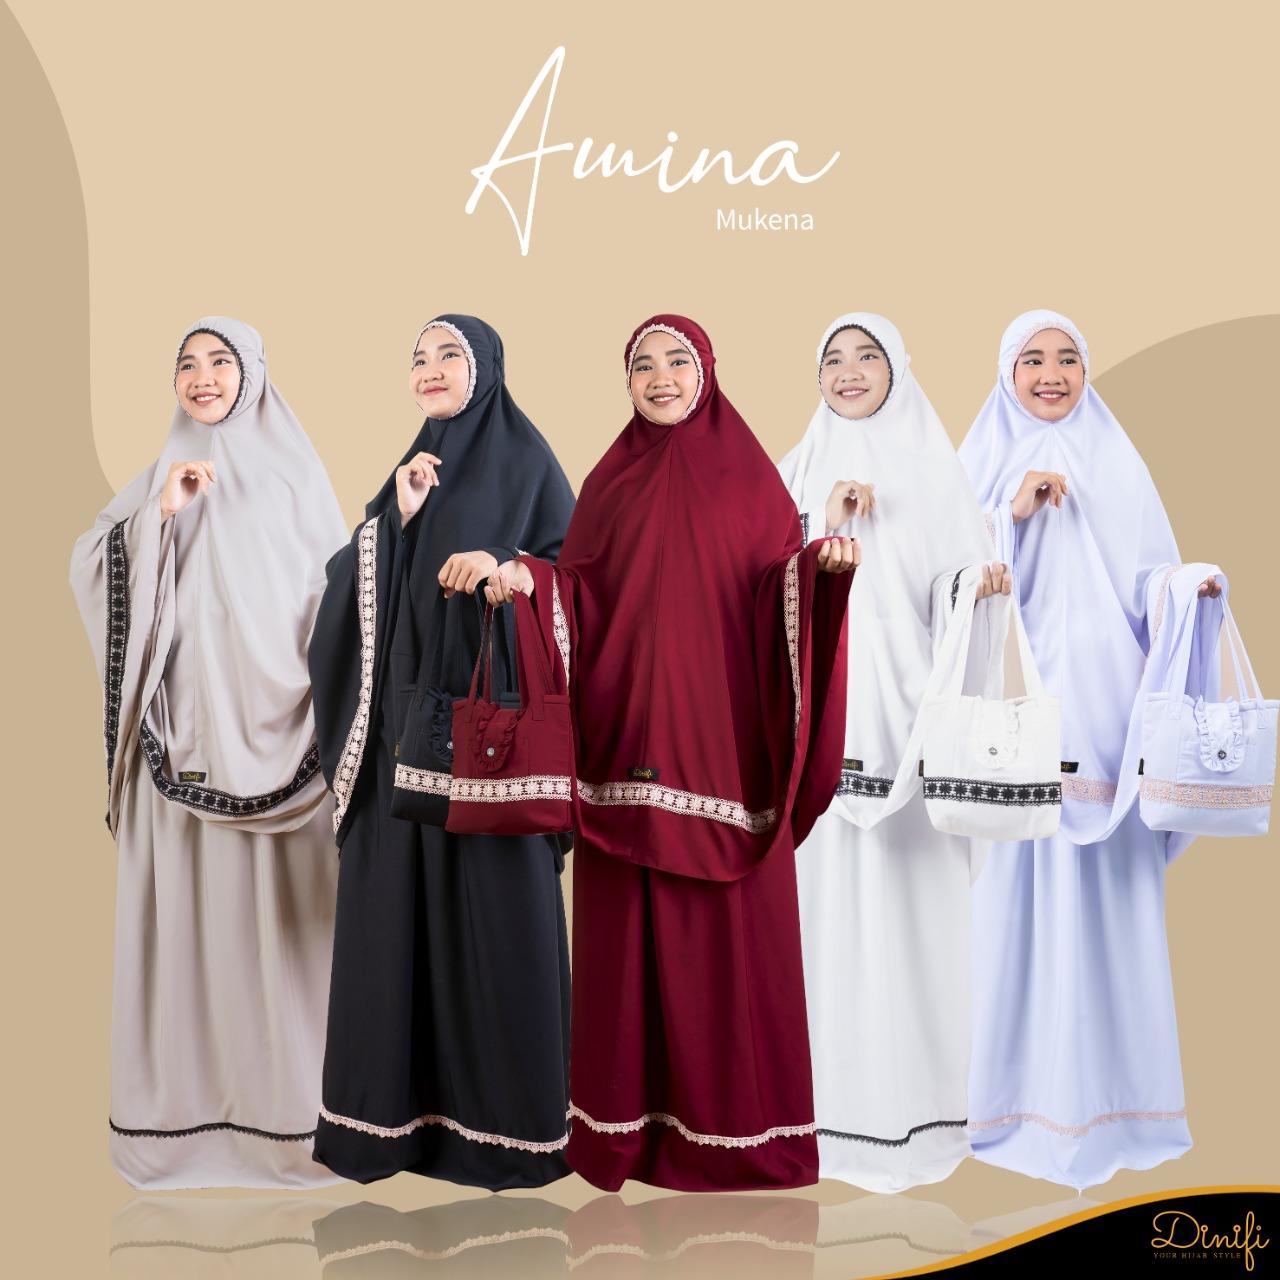 Mukena Amina